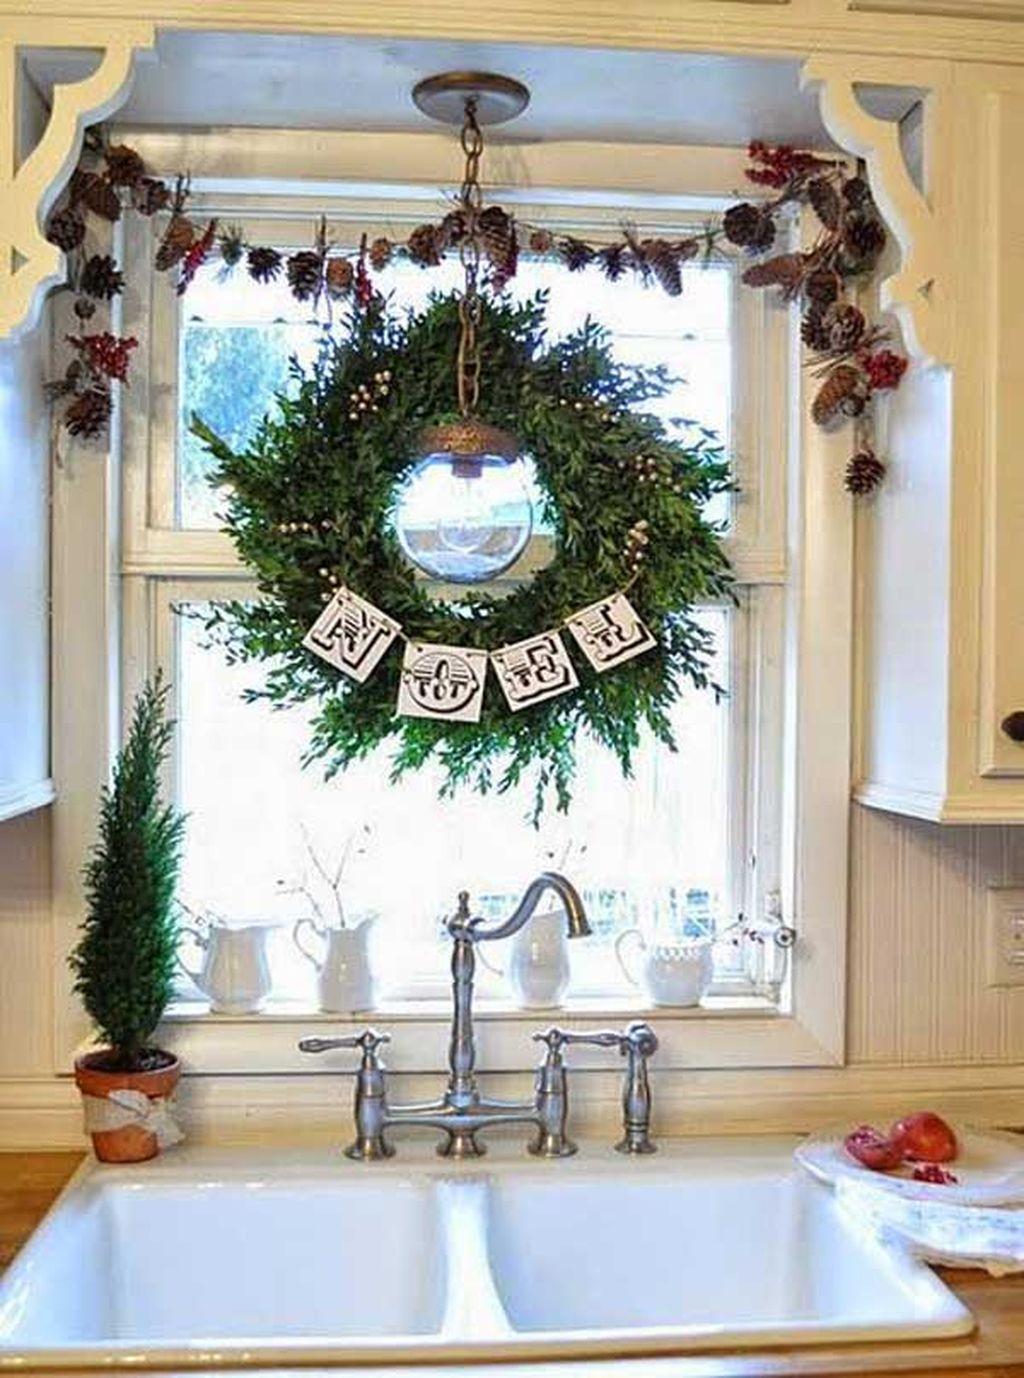 Adorable Rustic Christmas Kitchen Decoration Ideas 45